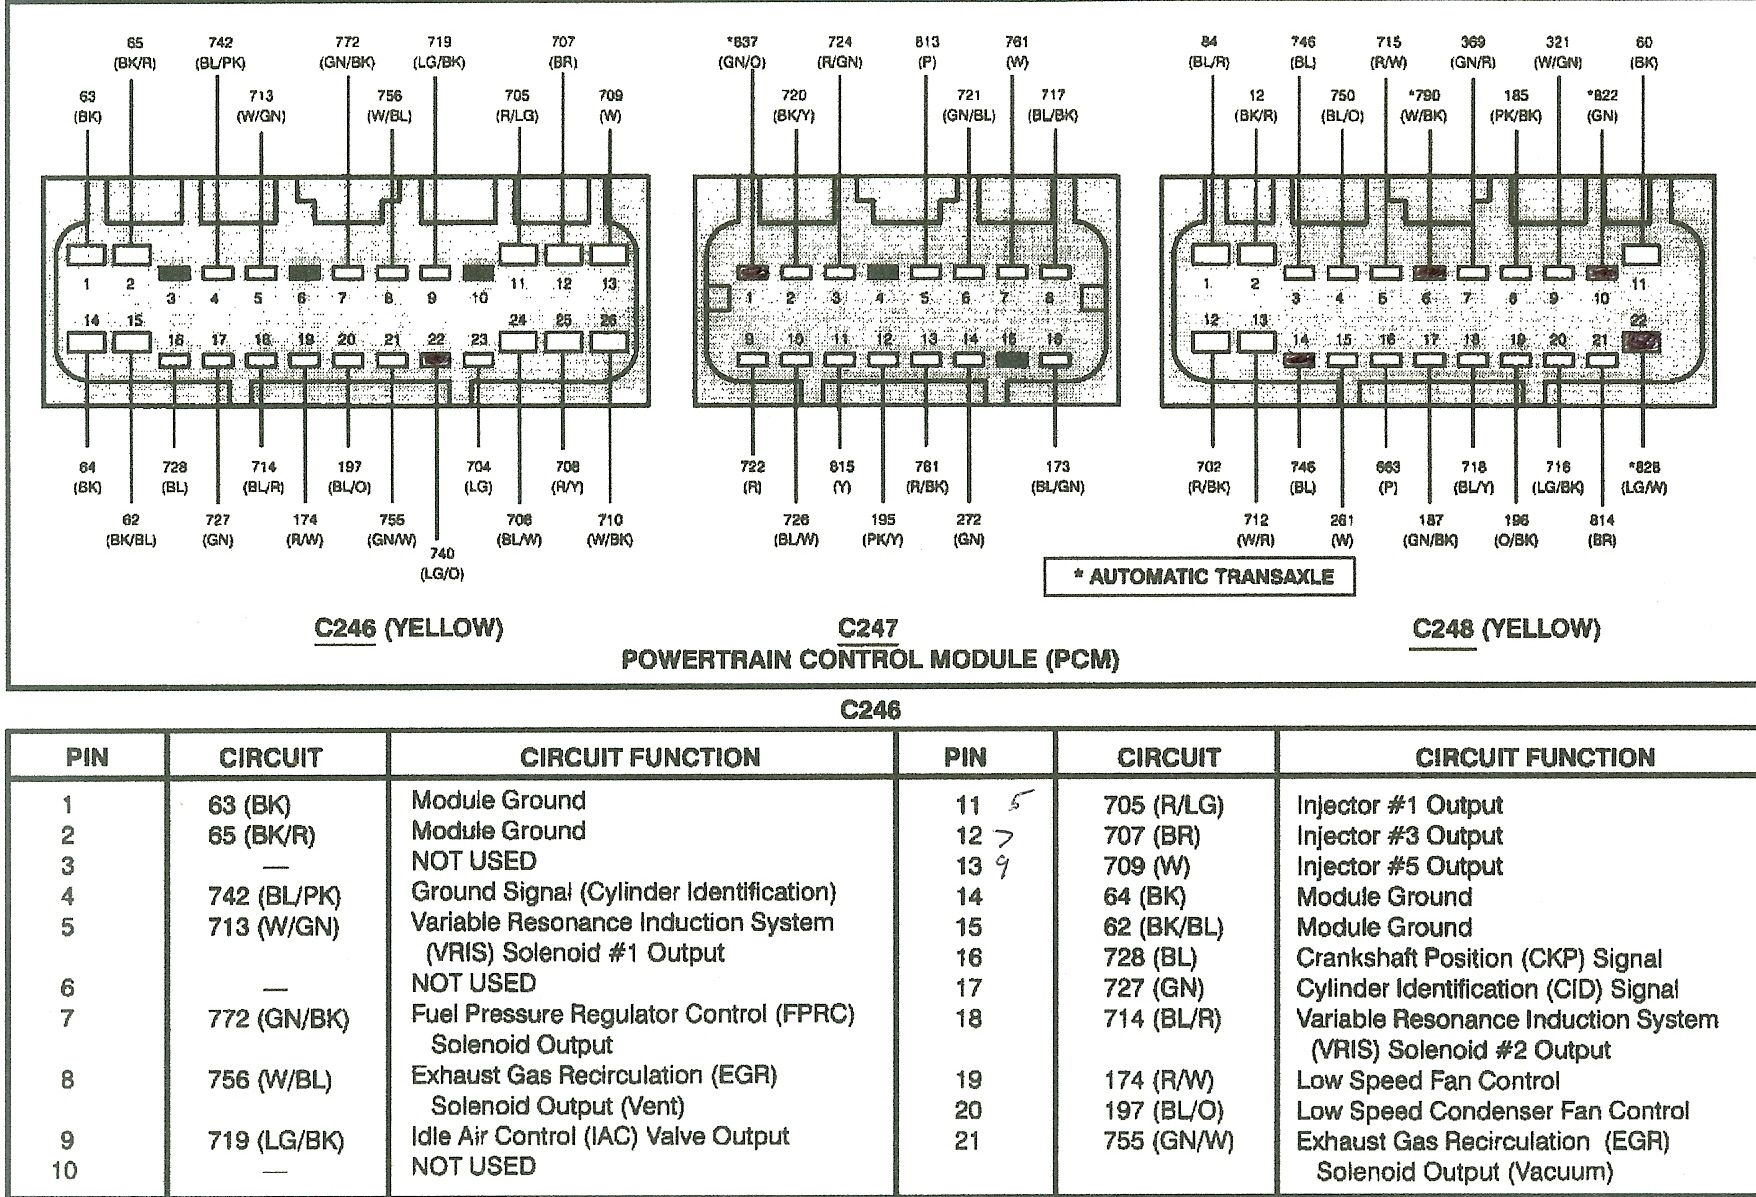 pinouts wiring diagram pcm to ecm 4 7 2002 dodge ram intoautos com 2002 dodge durango pcm wiring diagram [ 1756 x 1197 Pixel ]